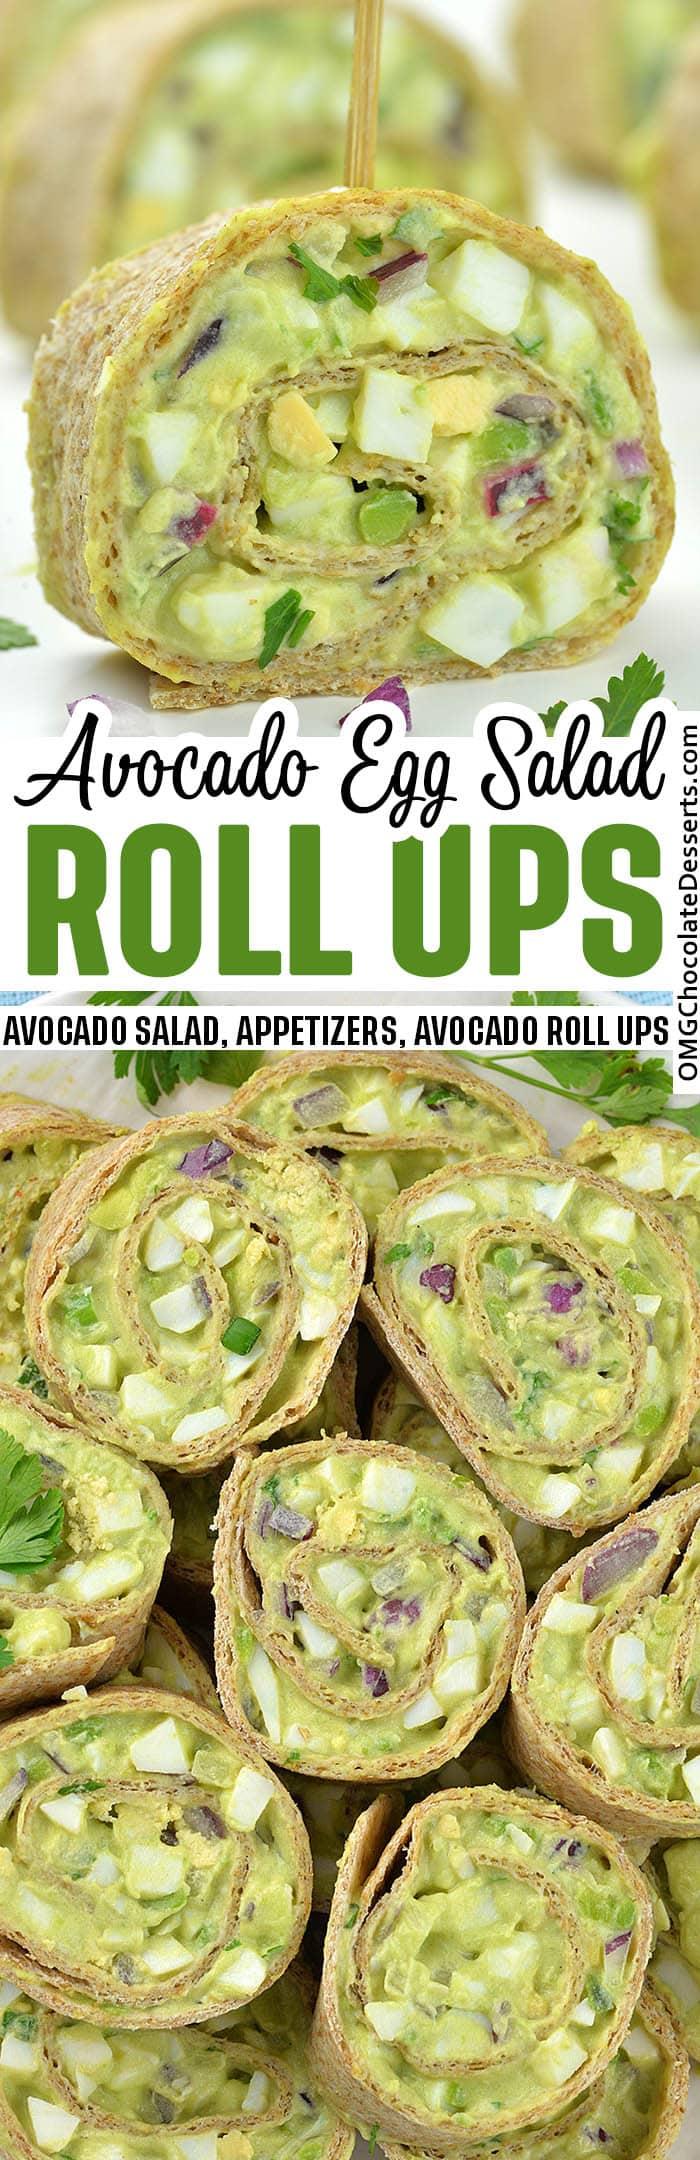 Avocado Egg Salad Roll Ups